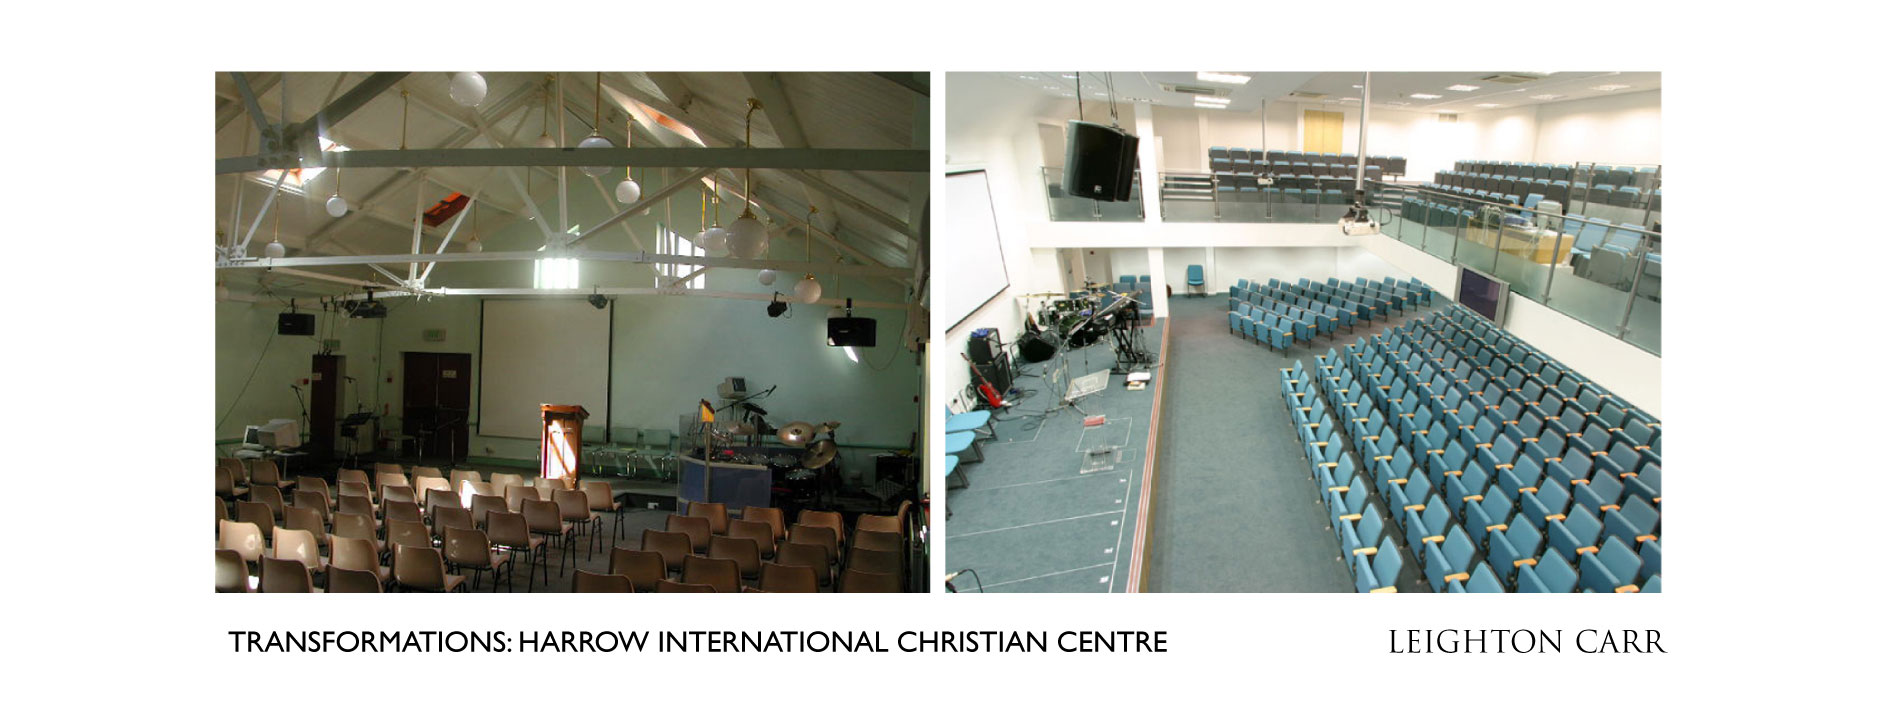 Harrow International Christian Centre